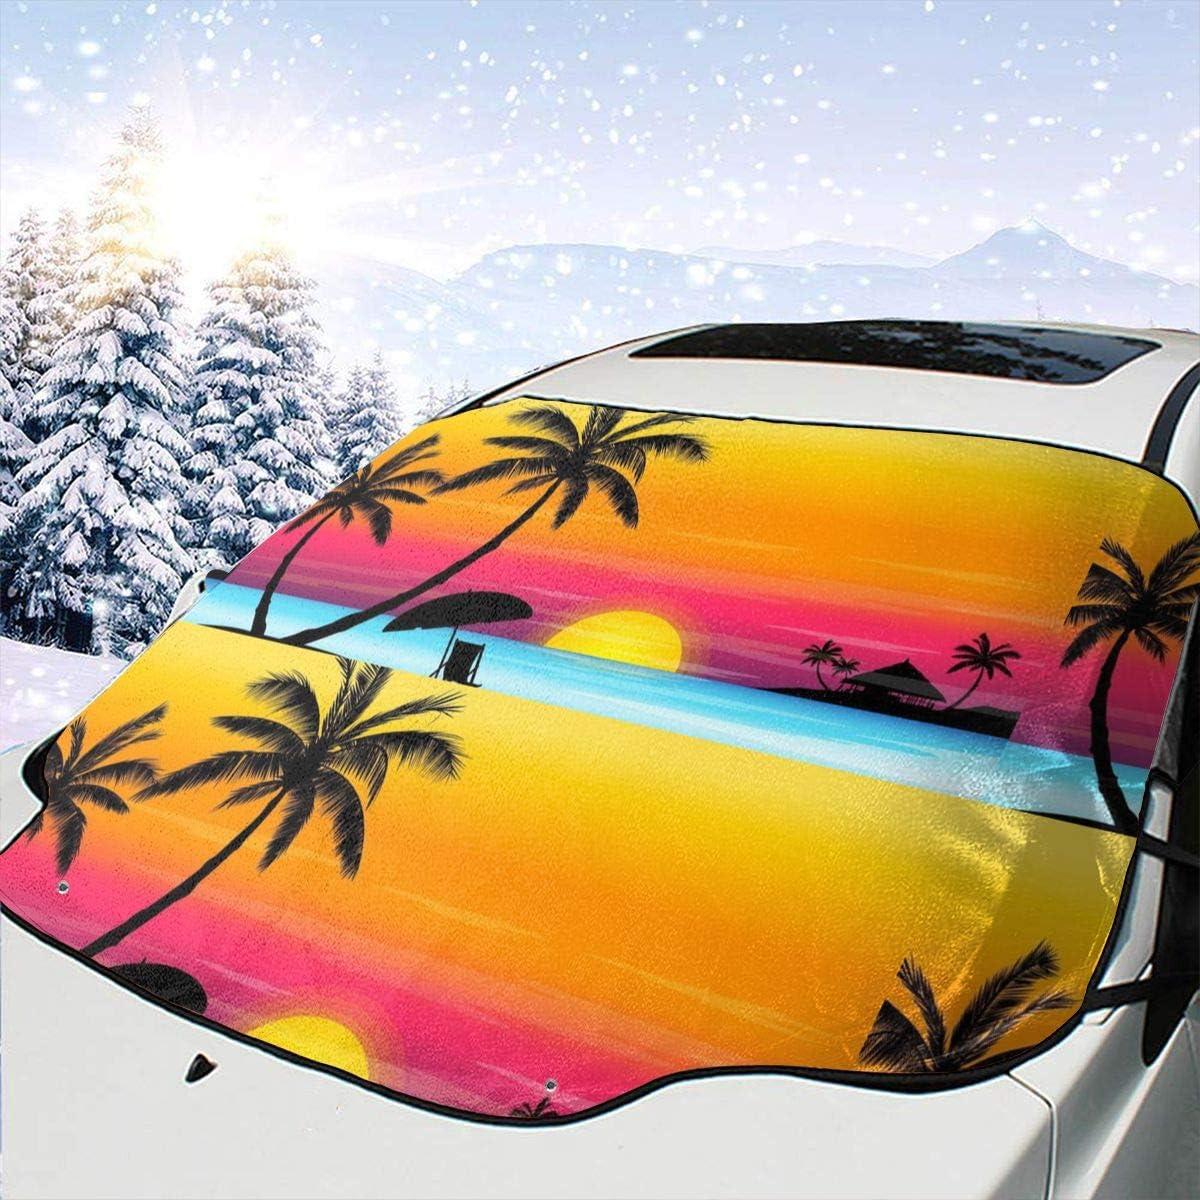 Doctor Who Car Sun Shade Automotive Sunshades Keeps Vehicle Cool Heat Shield